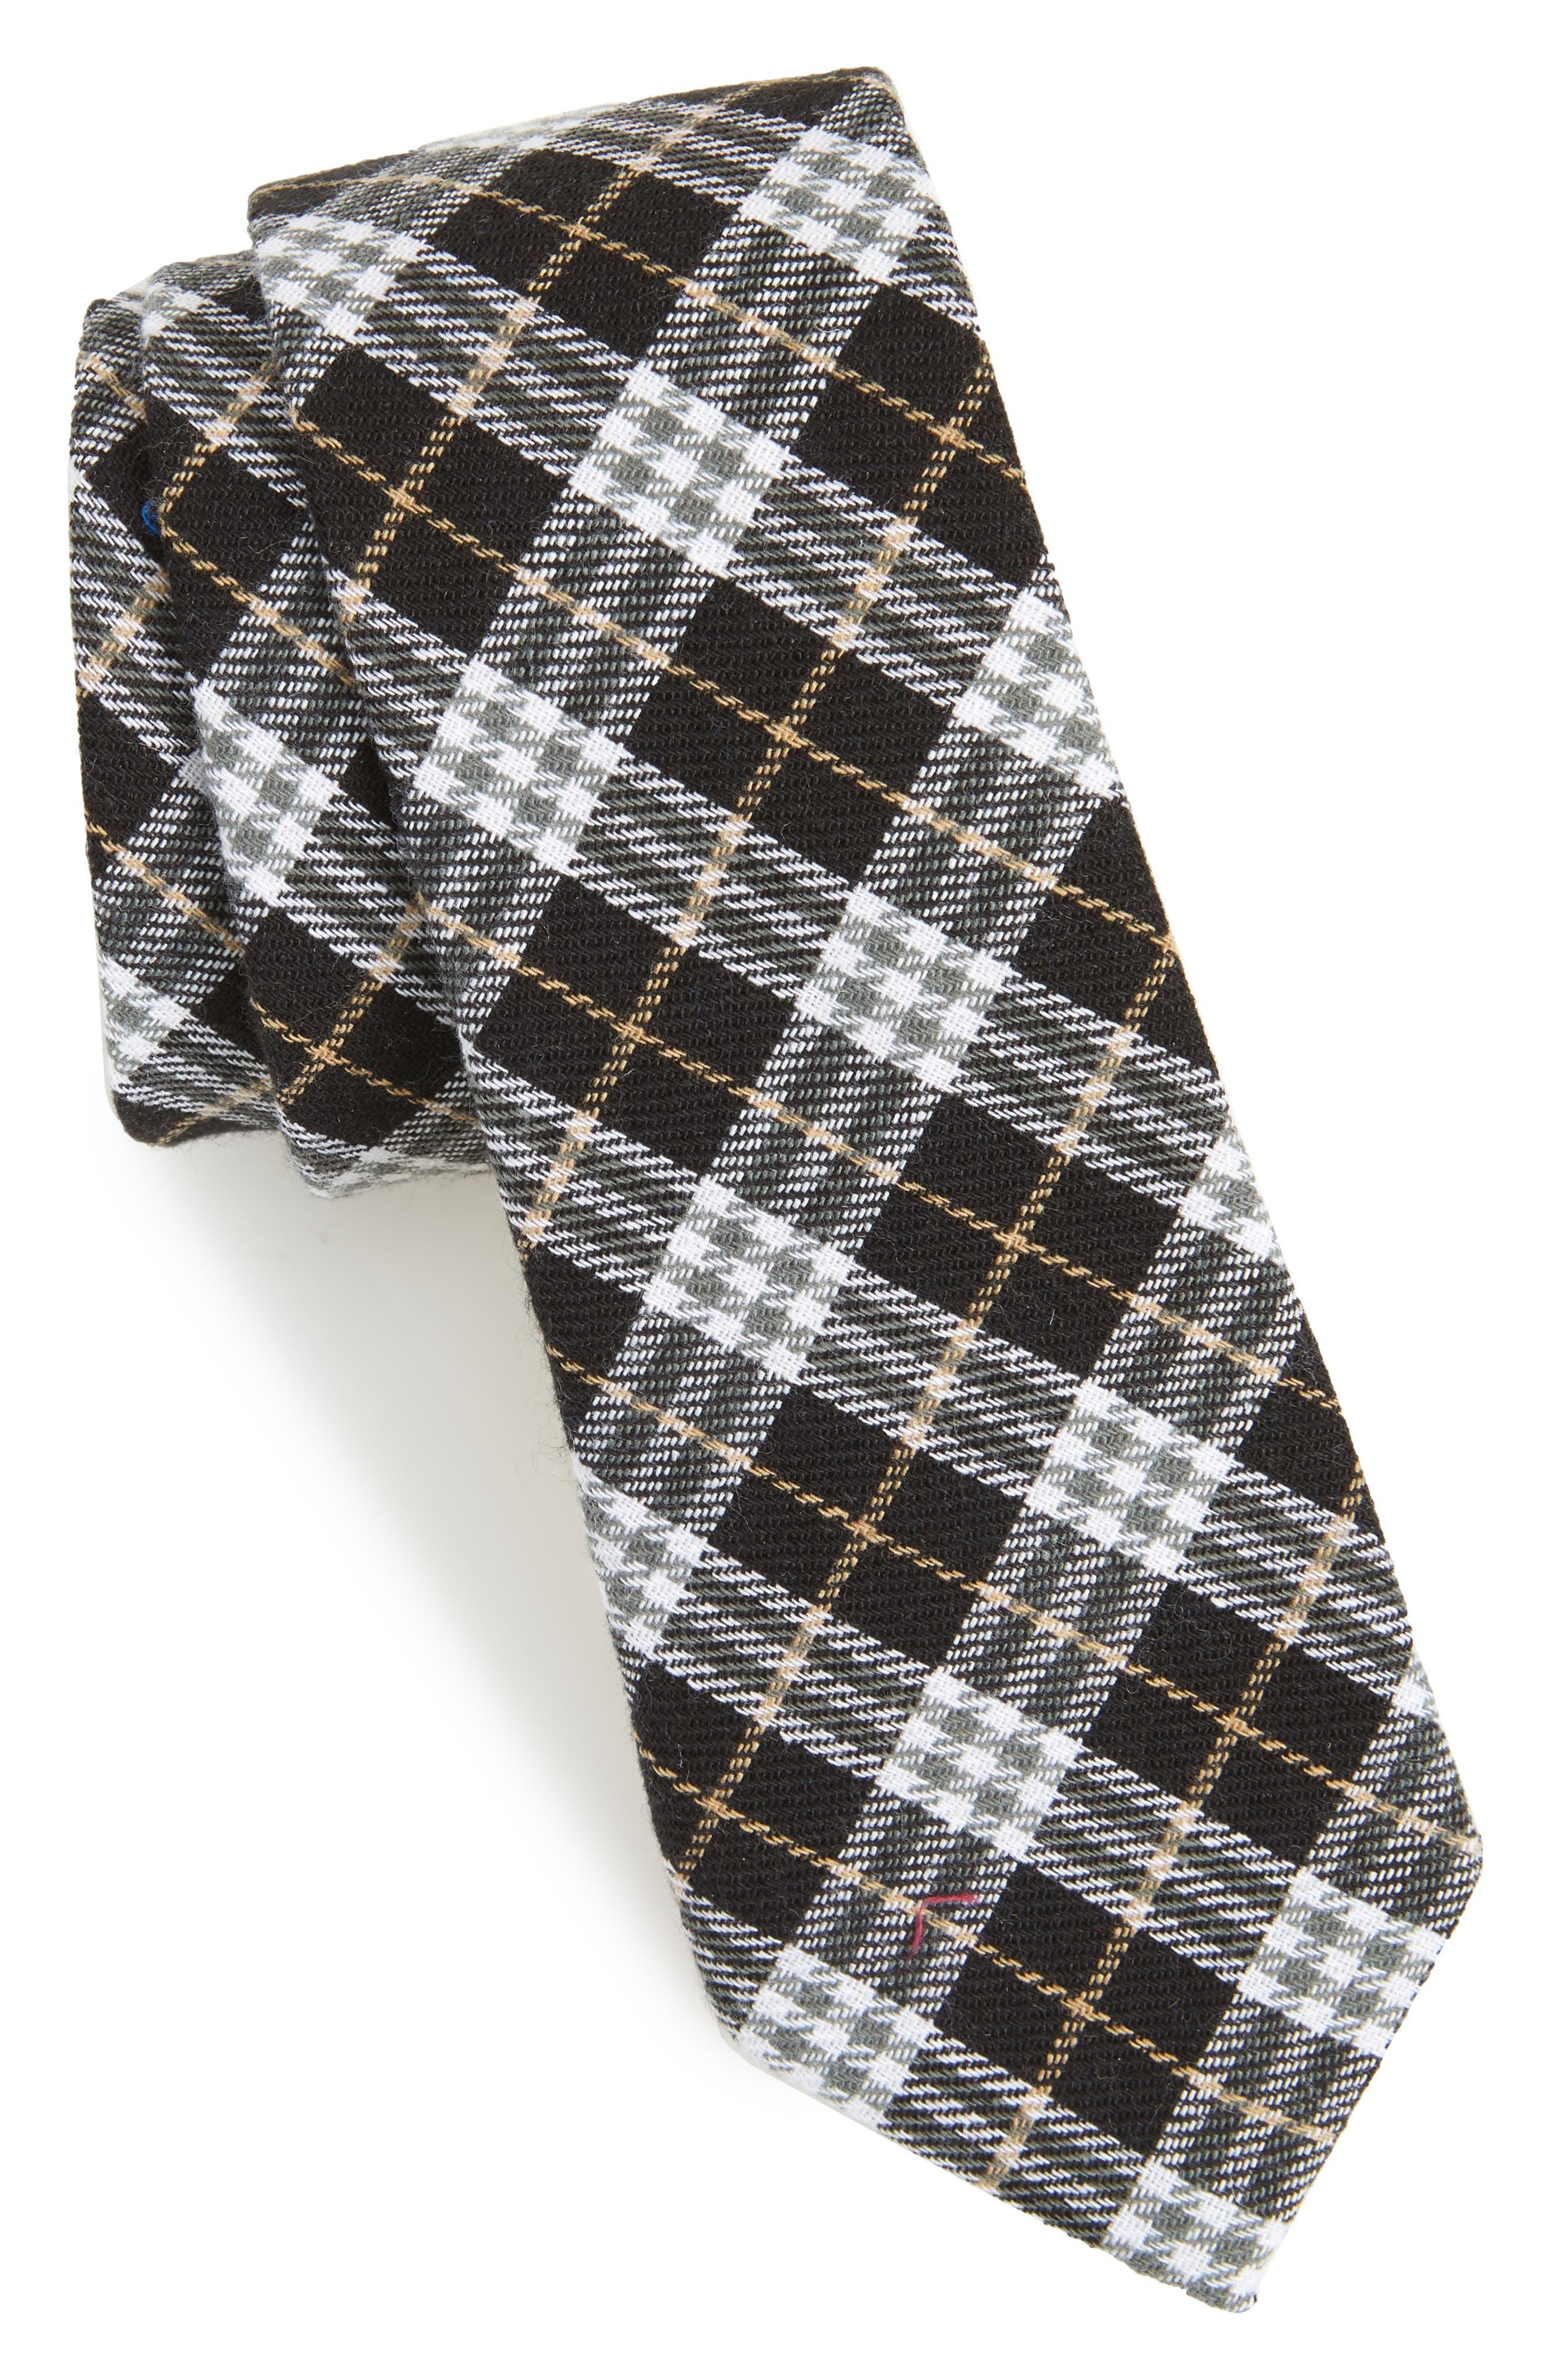 Alternate Image 1 Selected - 1901 Siegel Plaid Cotton & Linen Skinny Tie